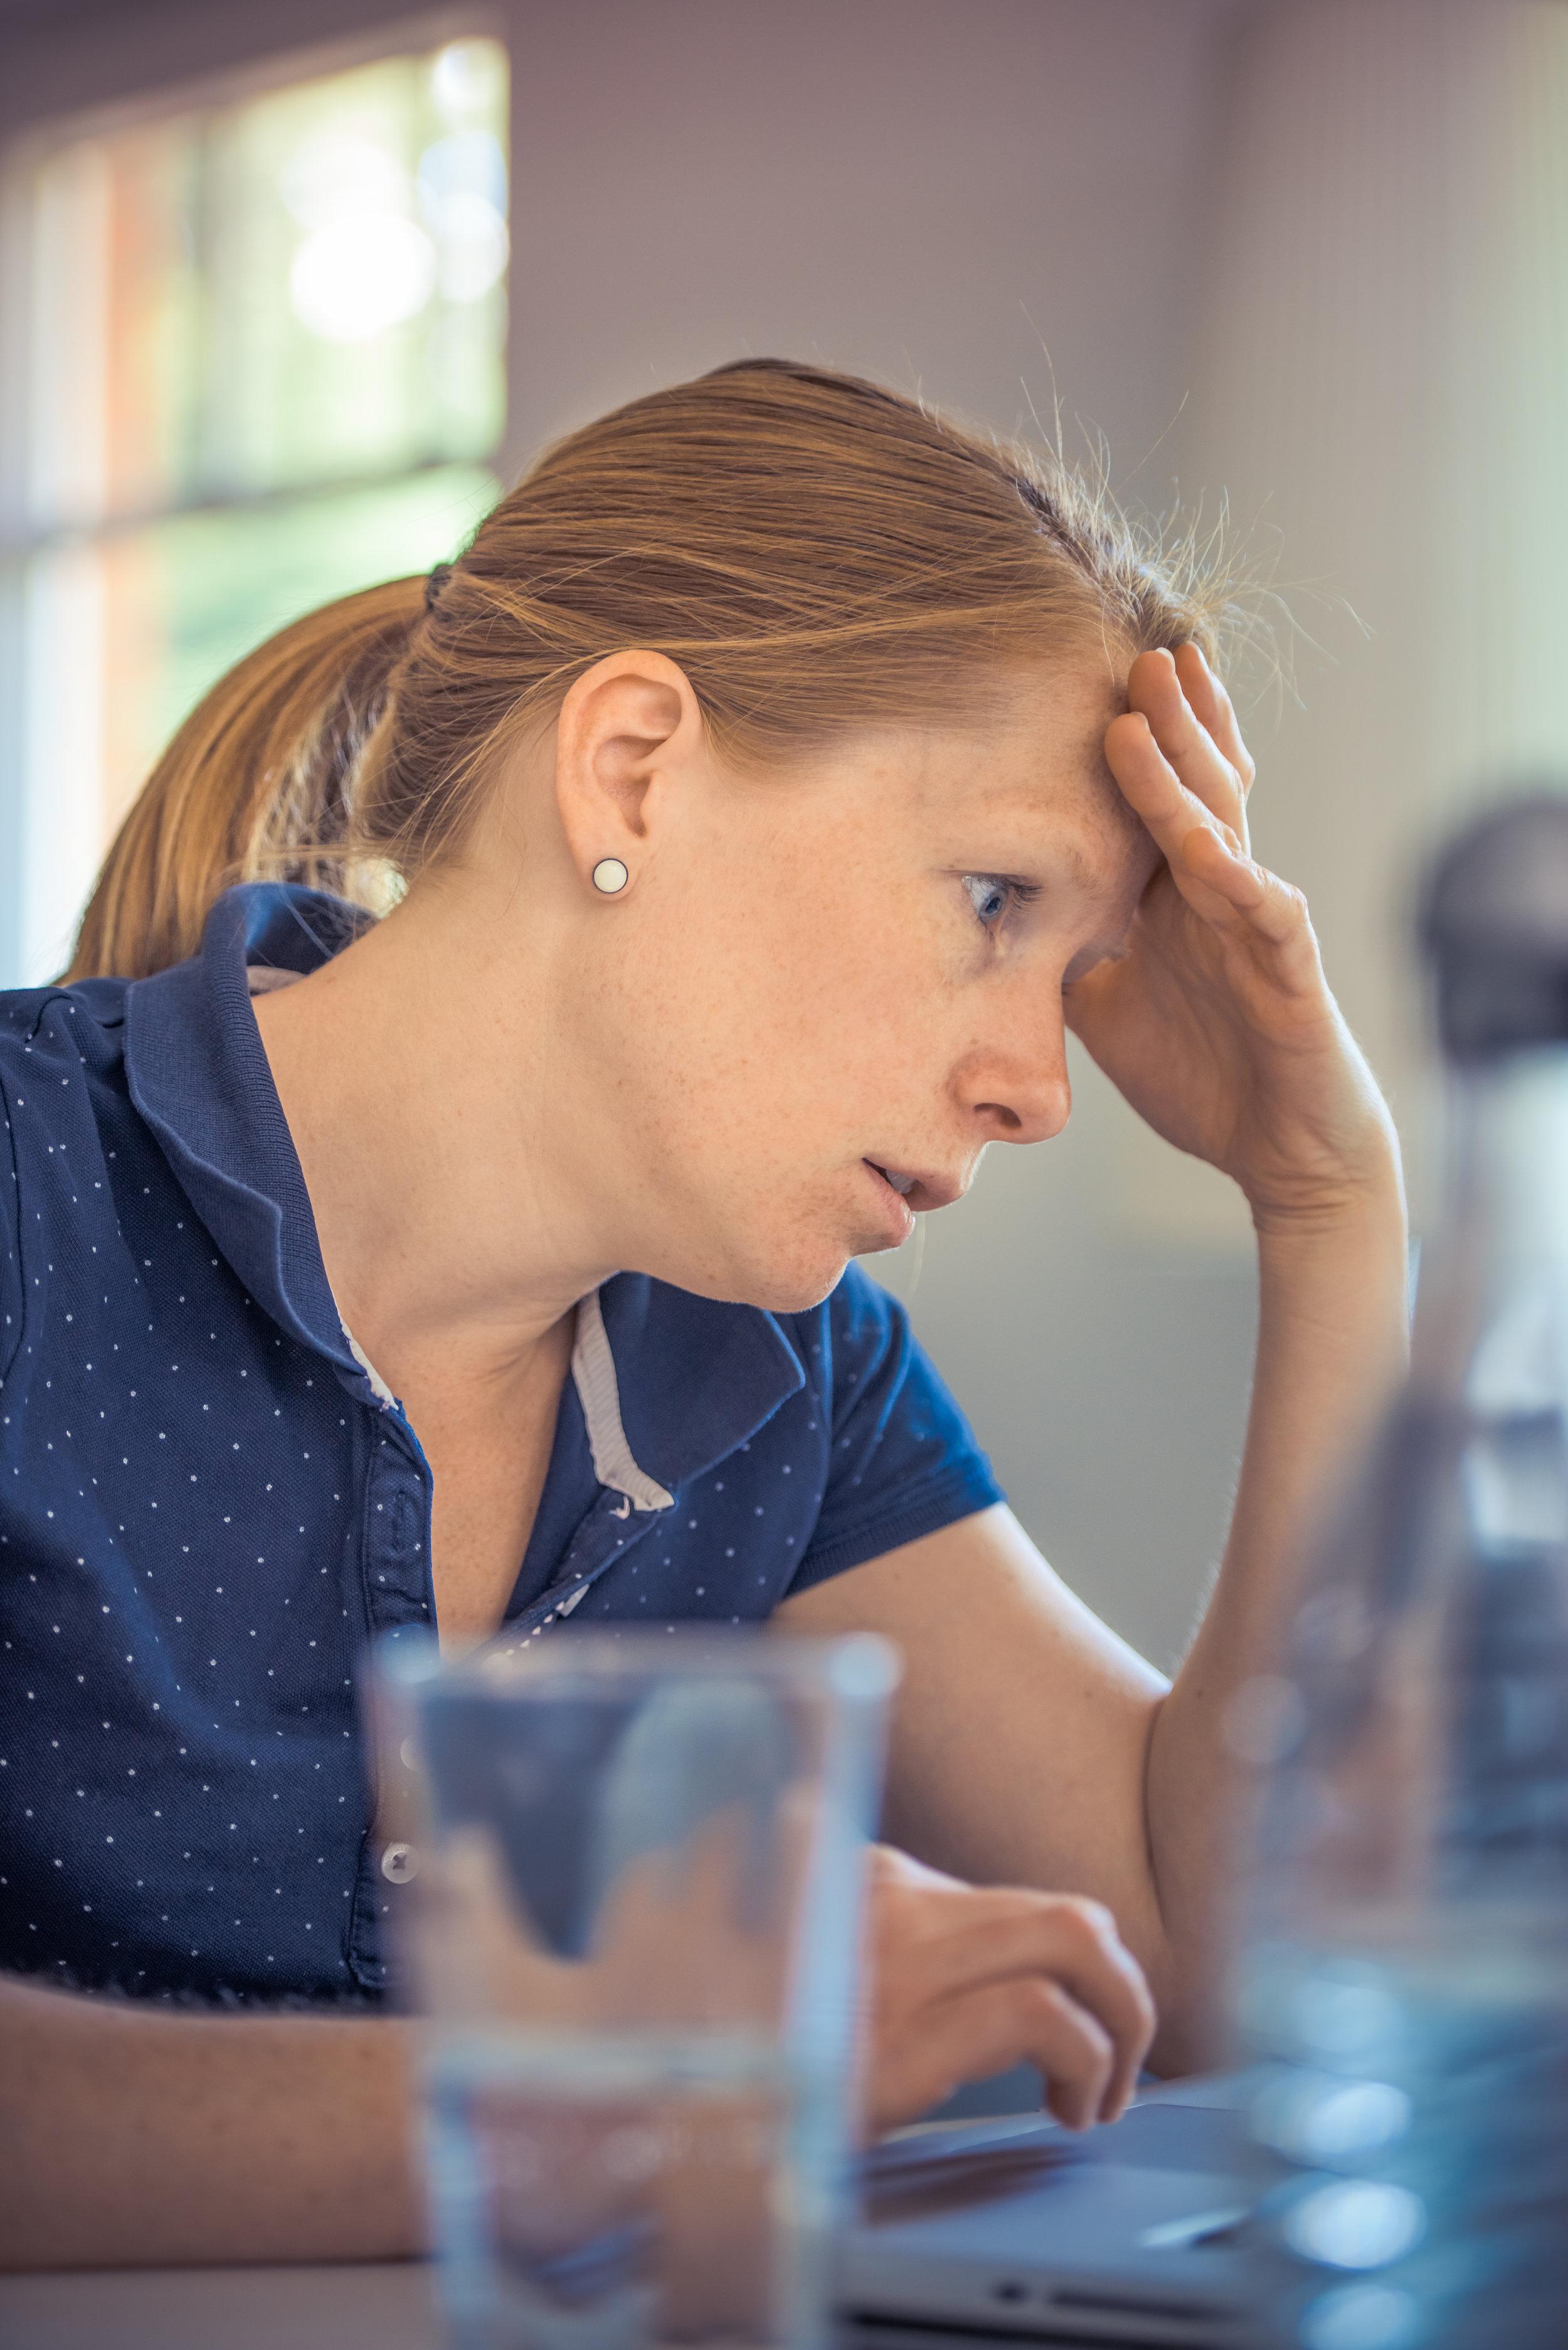 Stress and binge eating